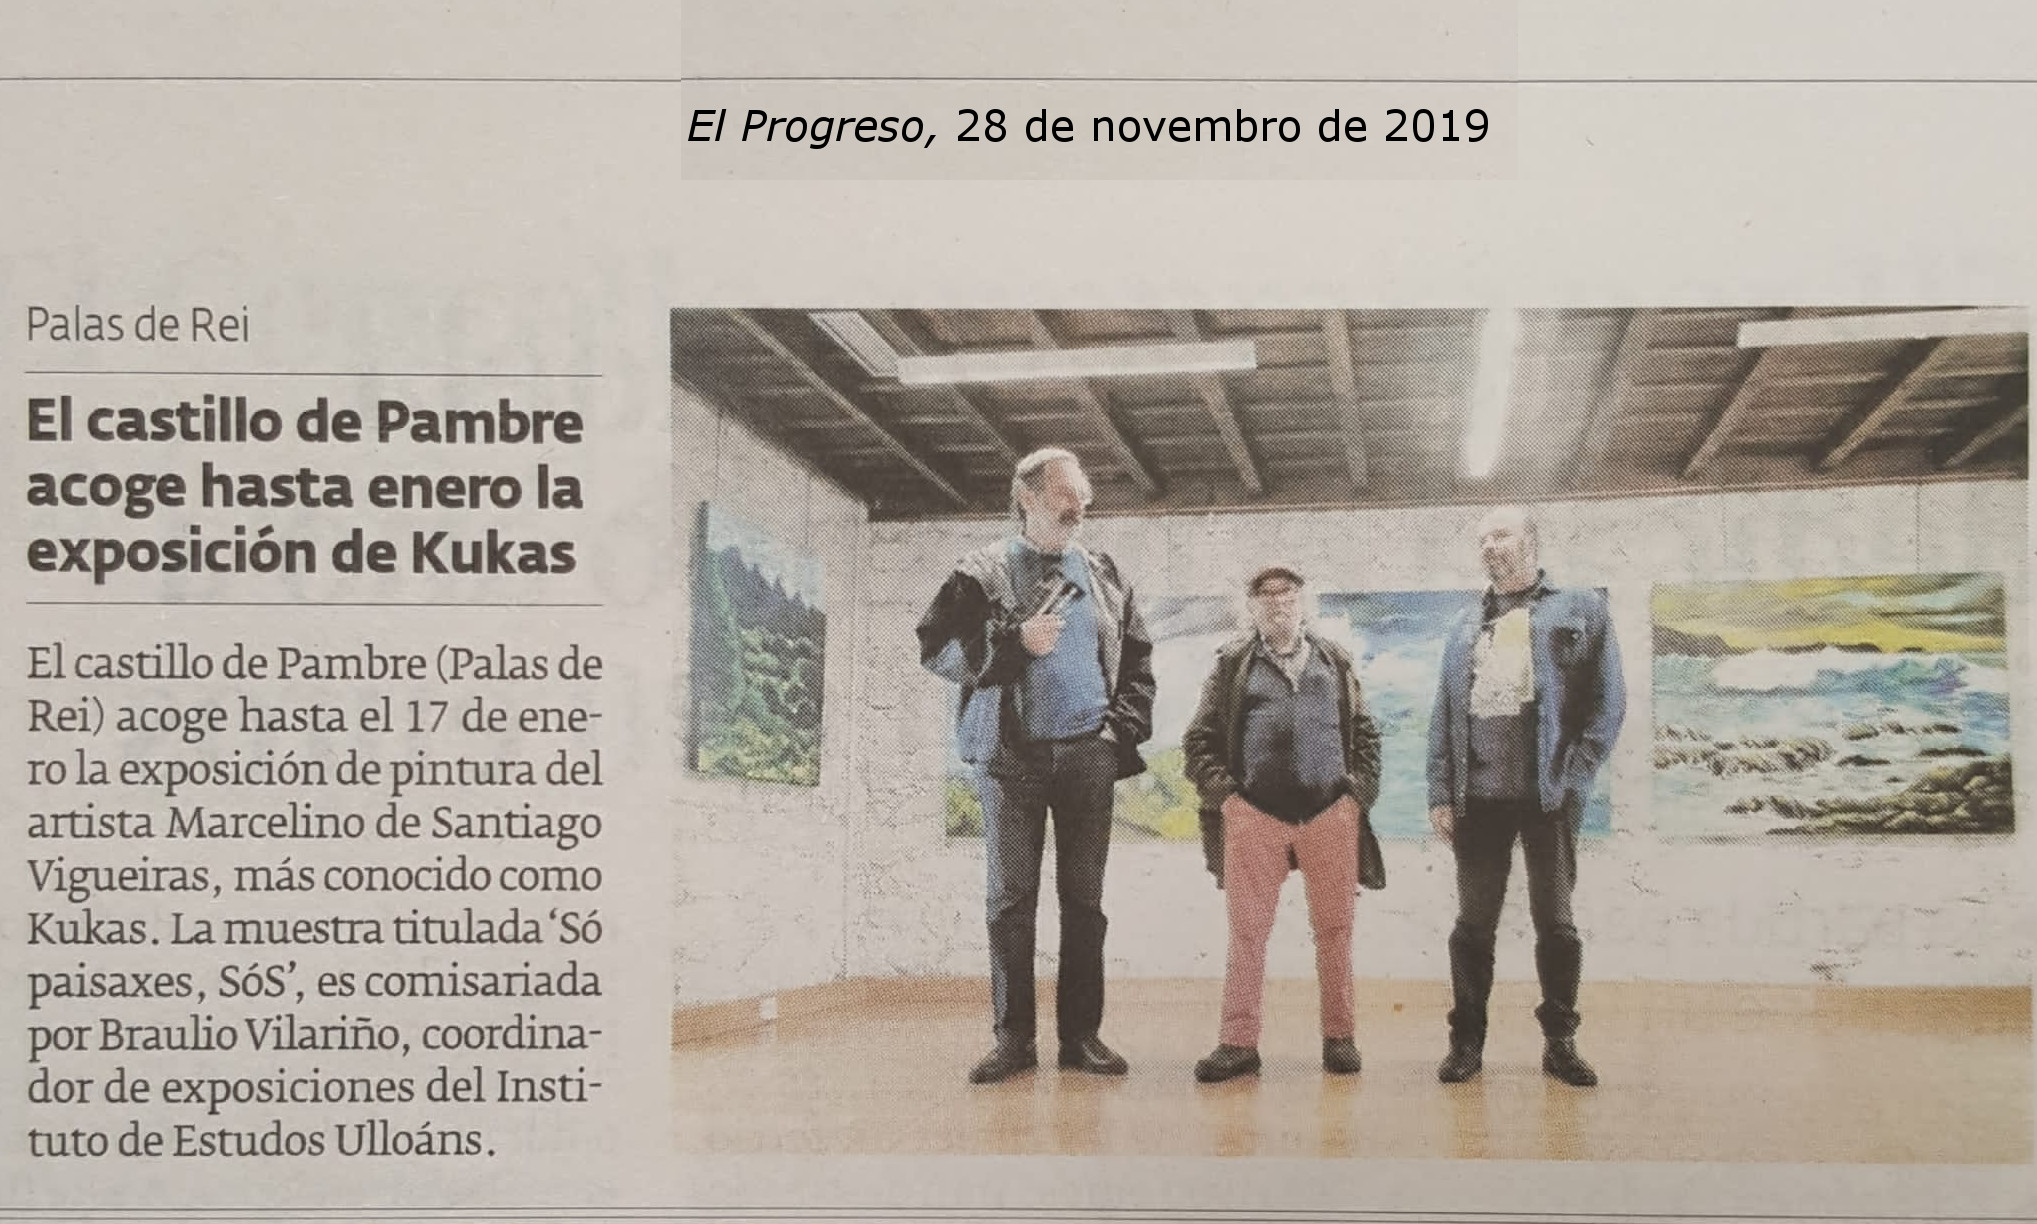 Exposición de Kukas, Instituto de estudos Ulloáns, IEU, castelo de Pambre, El progreso 28-11-2019